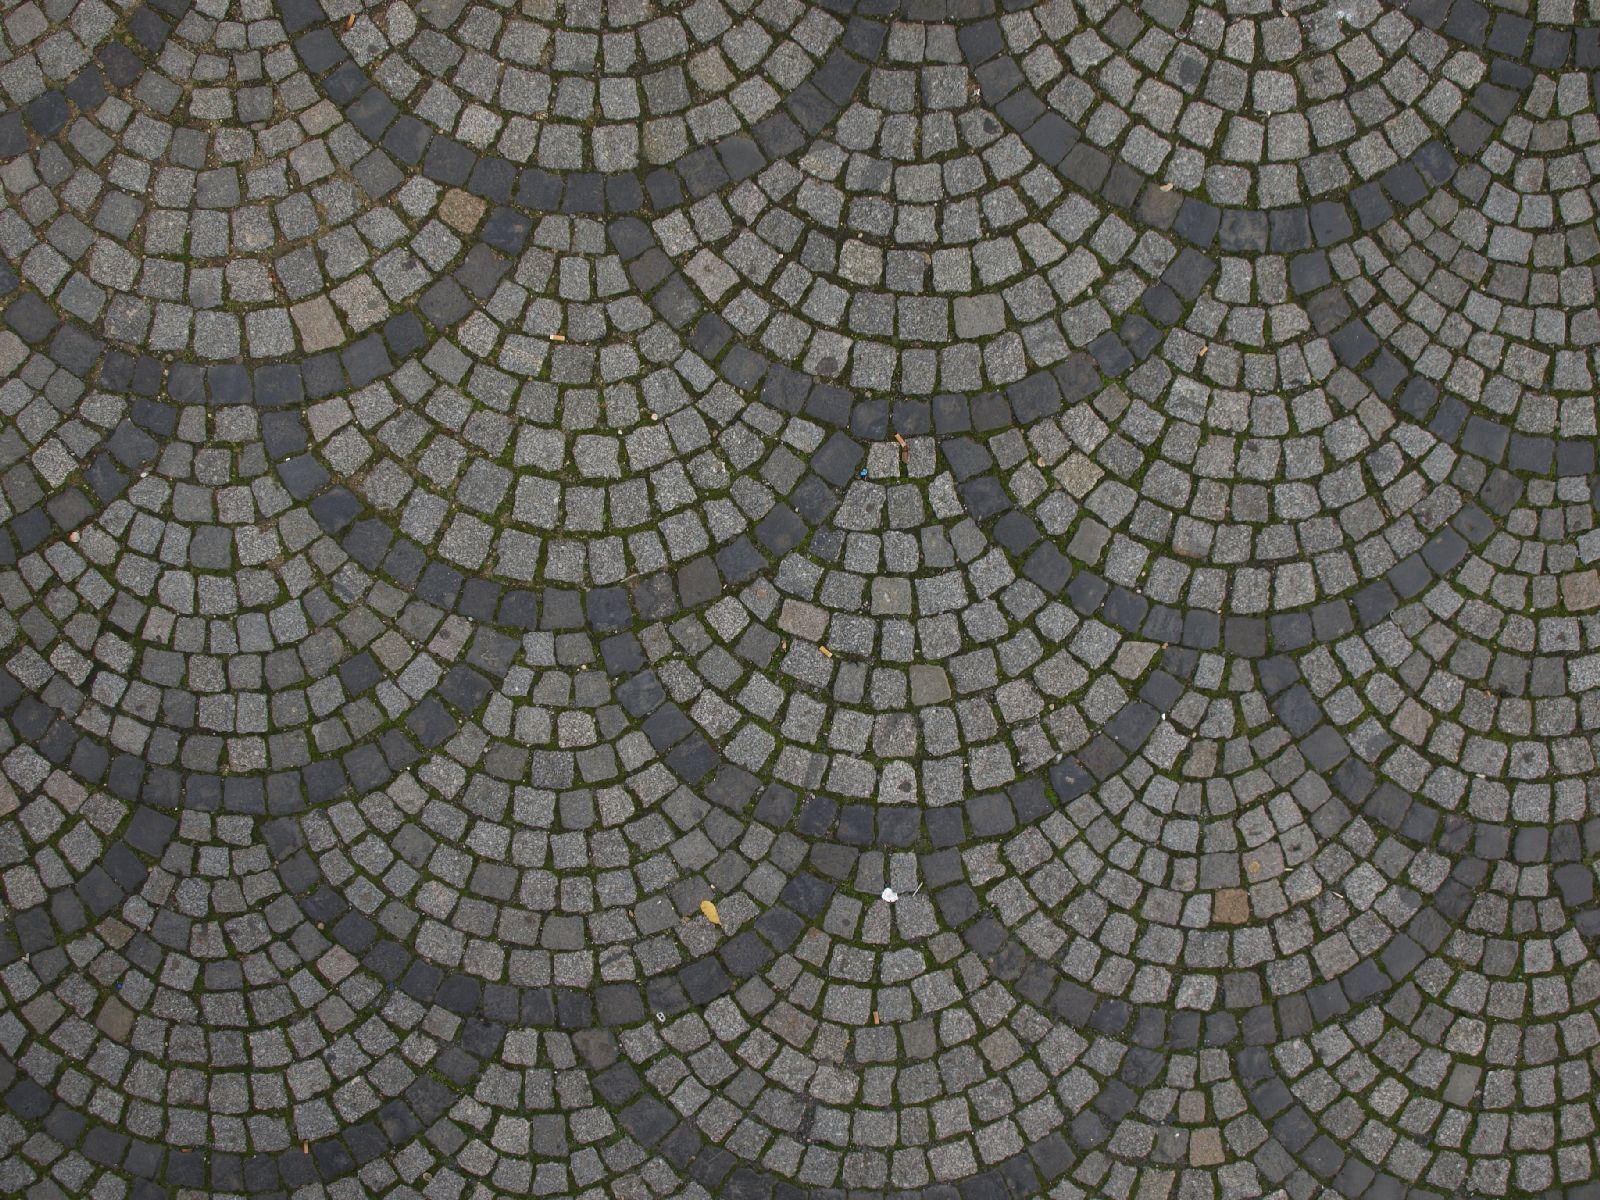 Ground-Urban_Texture_A_PB010879